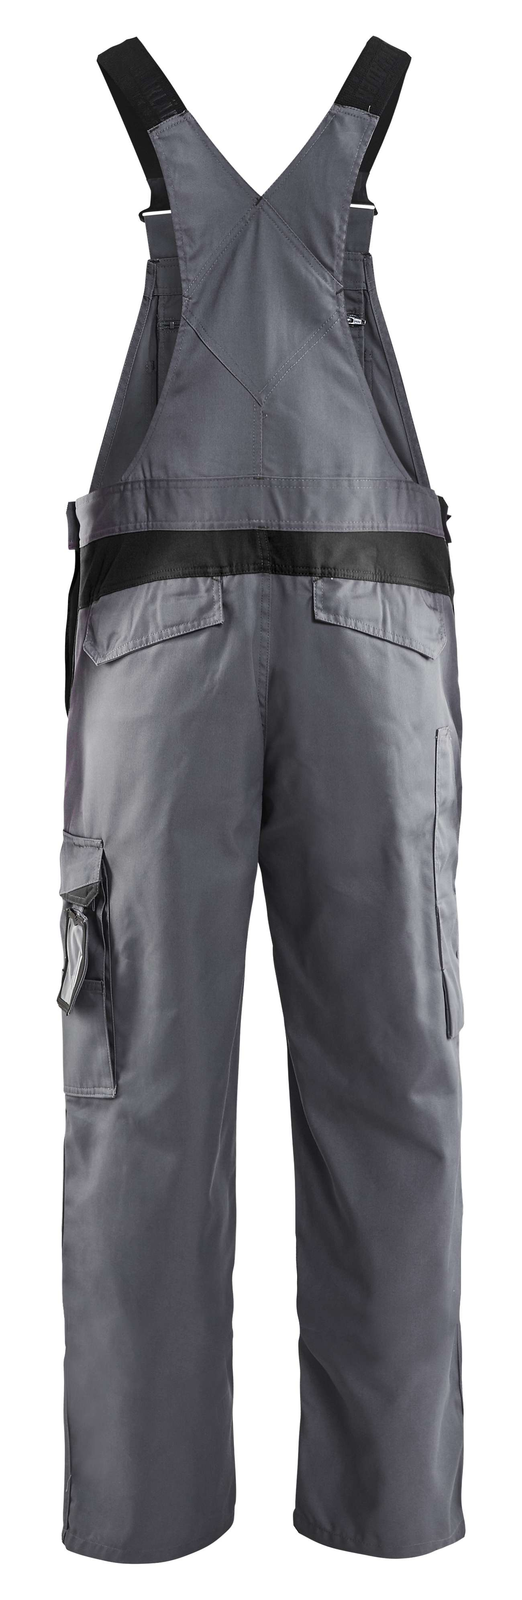 Blaklader Amerikaanse overalls 26641800 grijs-zwart(9499)